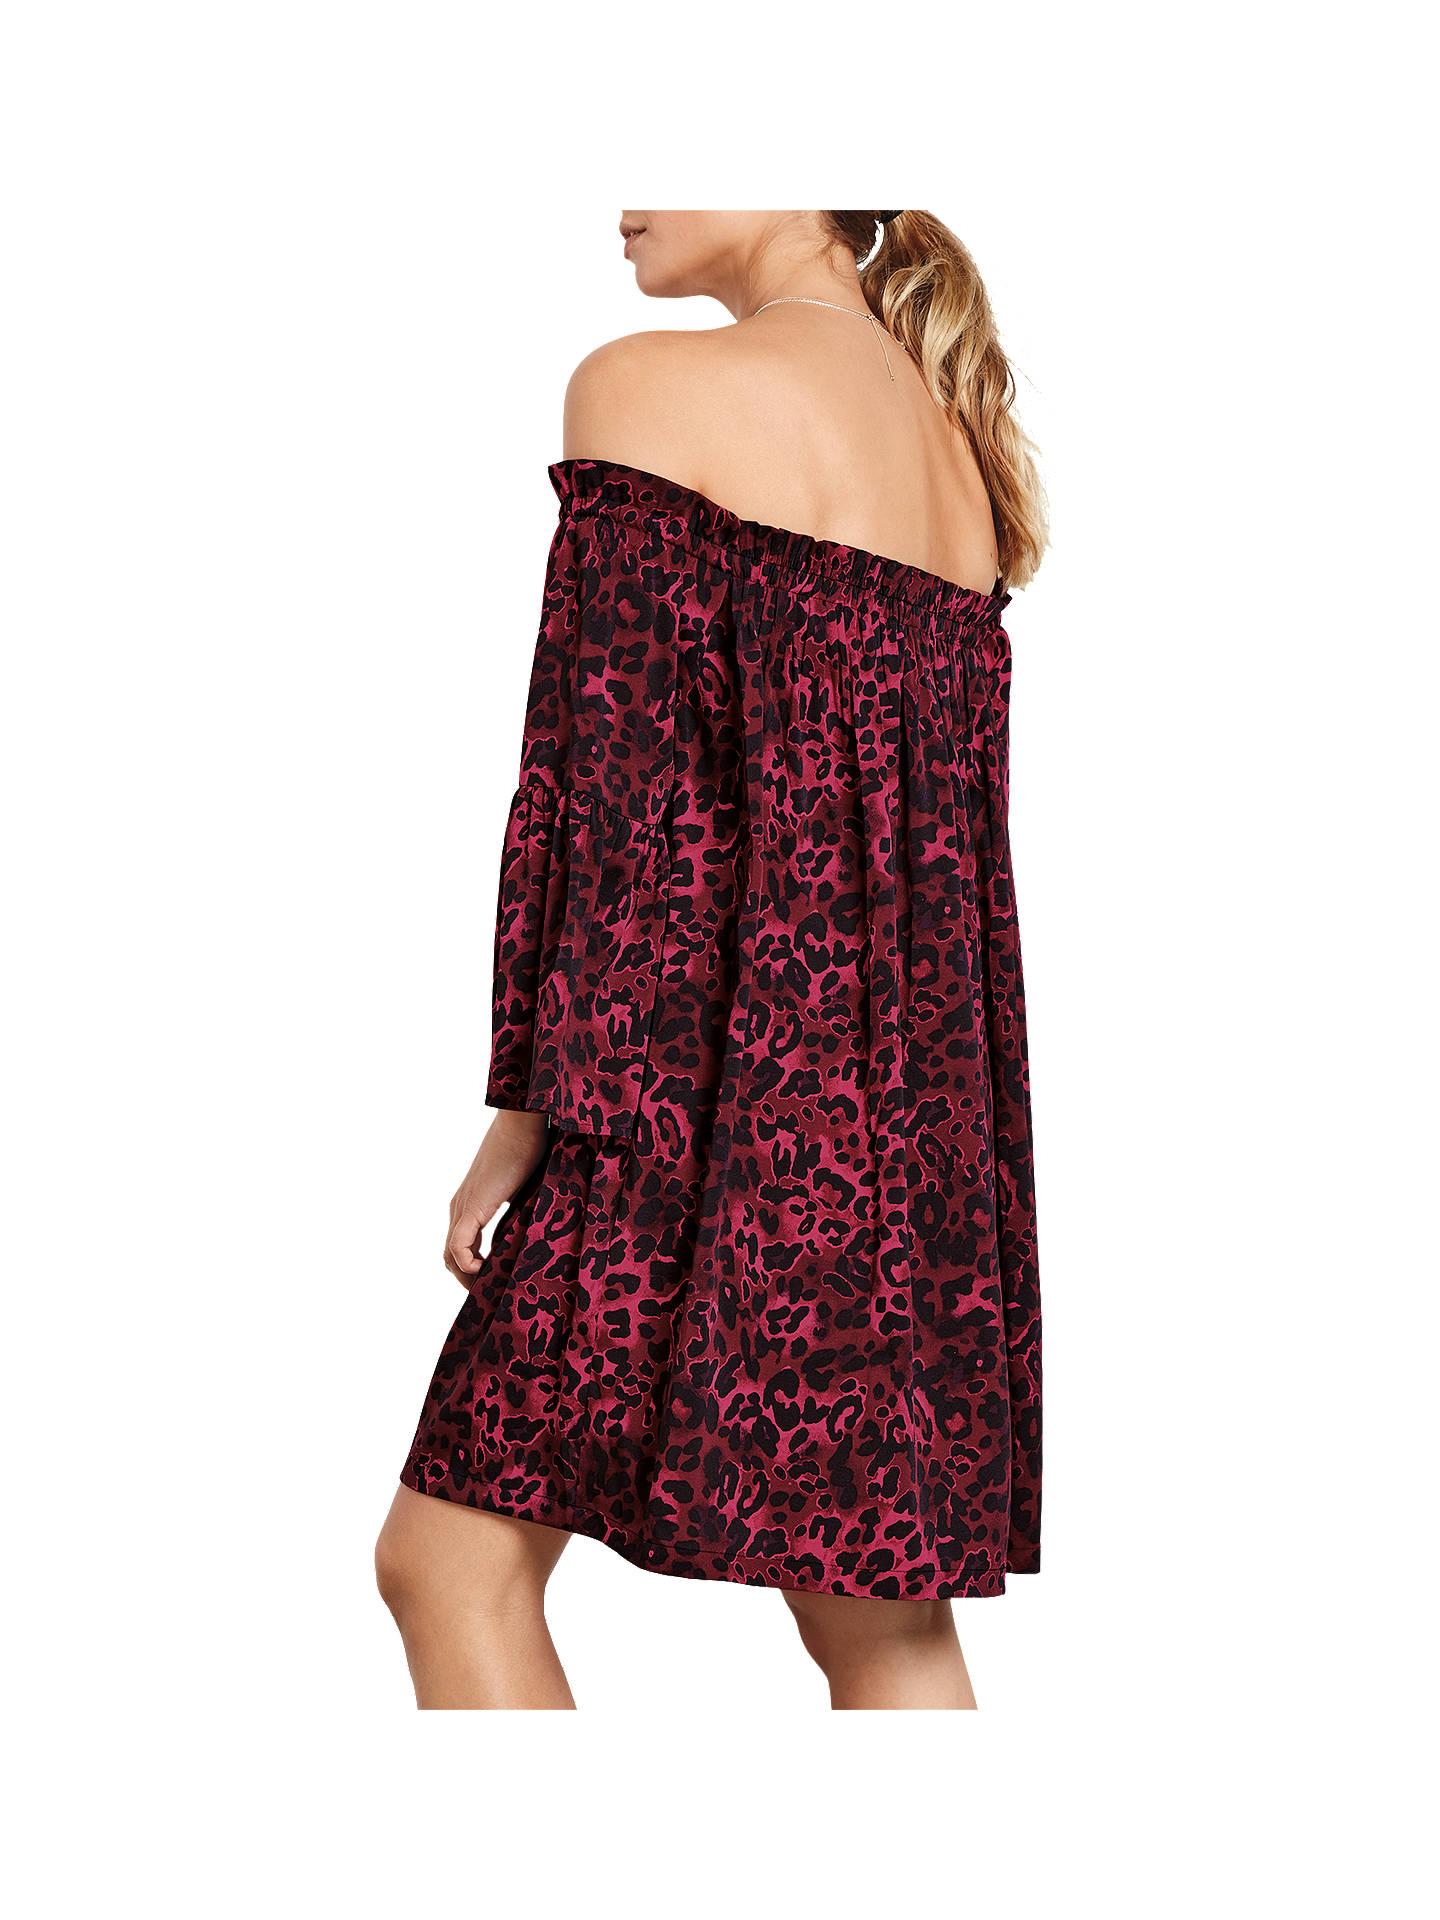 cf17ab9cf216 ... Buy hush Bryony Leopard Dress, Burgundy, 6 Online at johnlewis.com ...